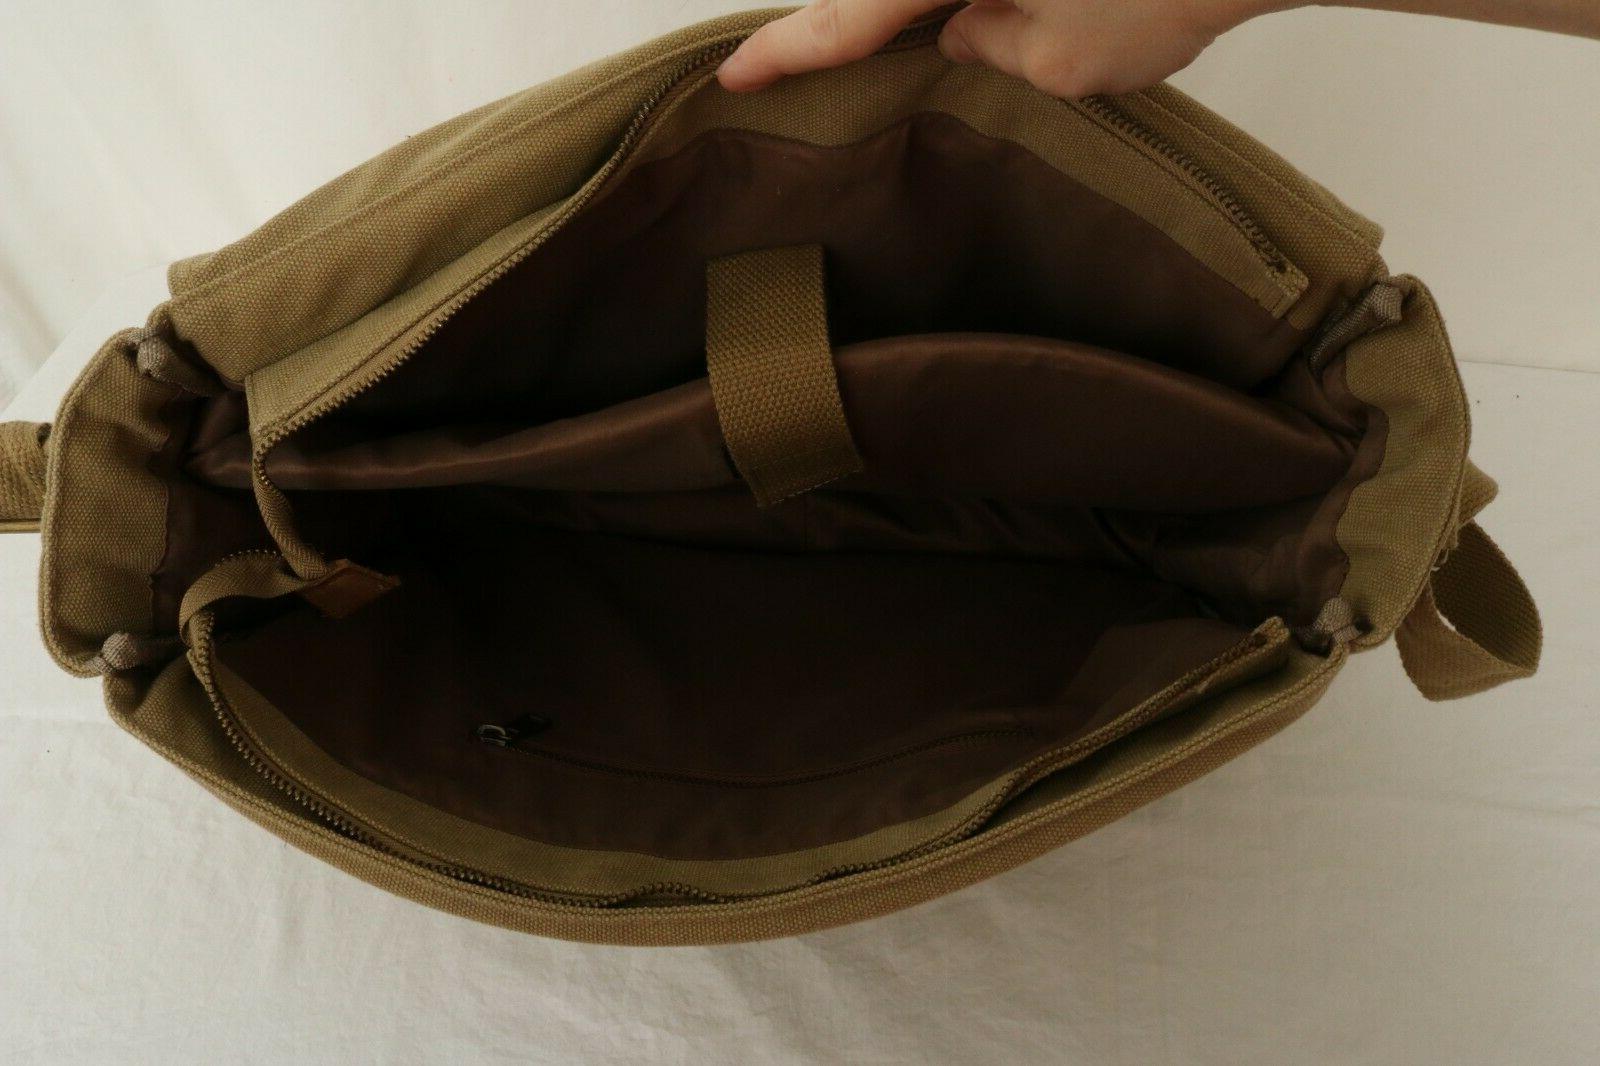 Sweetbriar Canvas Business Casual Messenger Bag